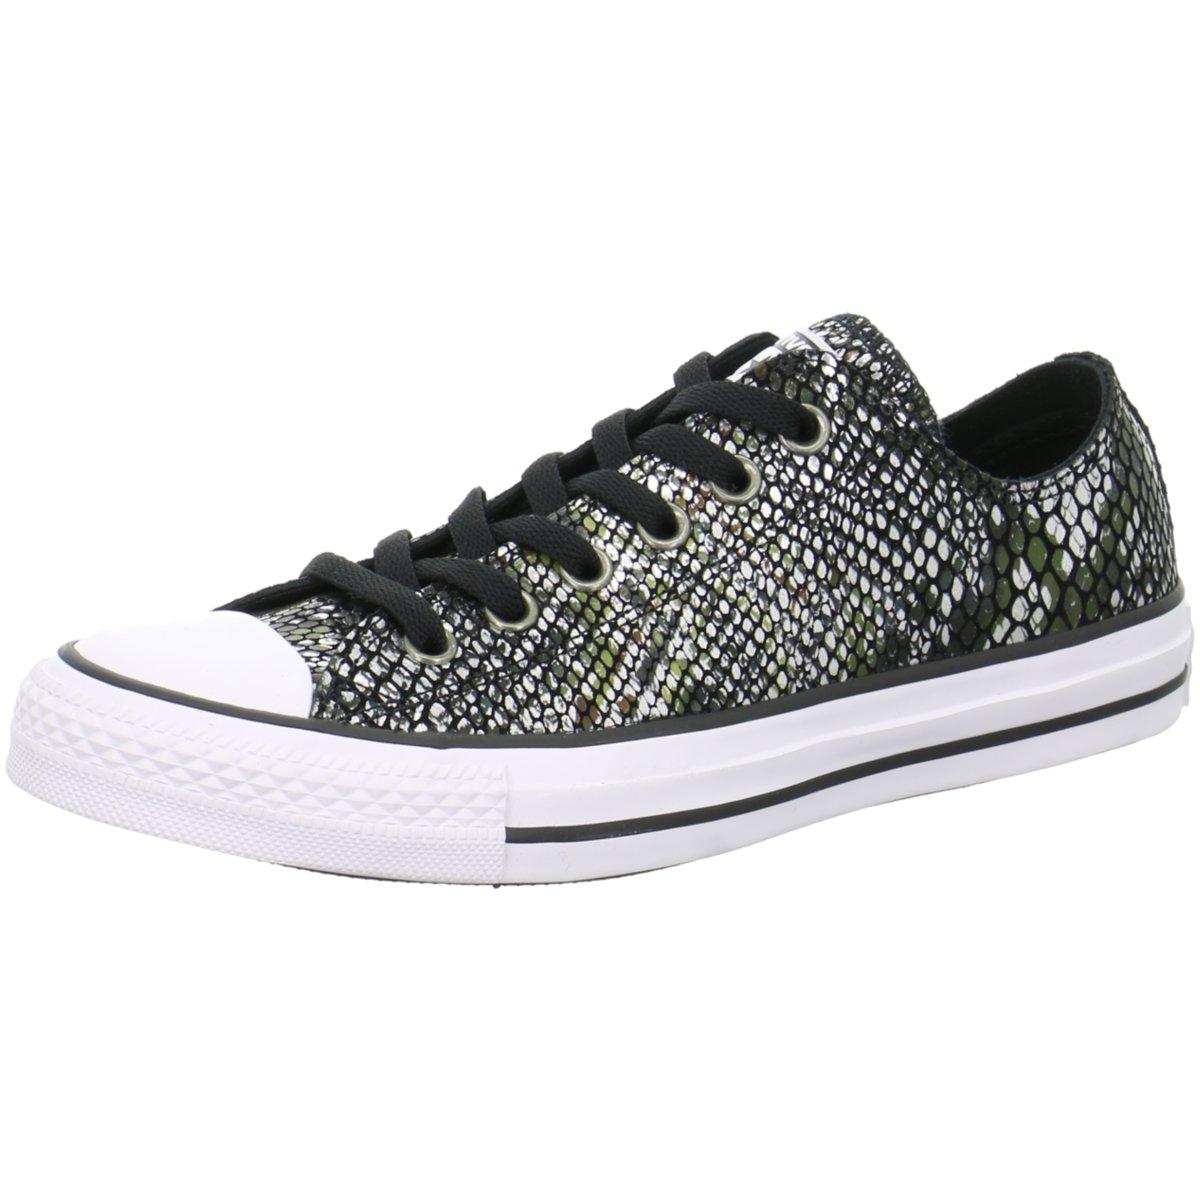 Details zu Converse Damen Sneaker NV 557981C schwarz 345512